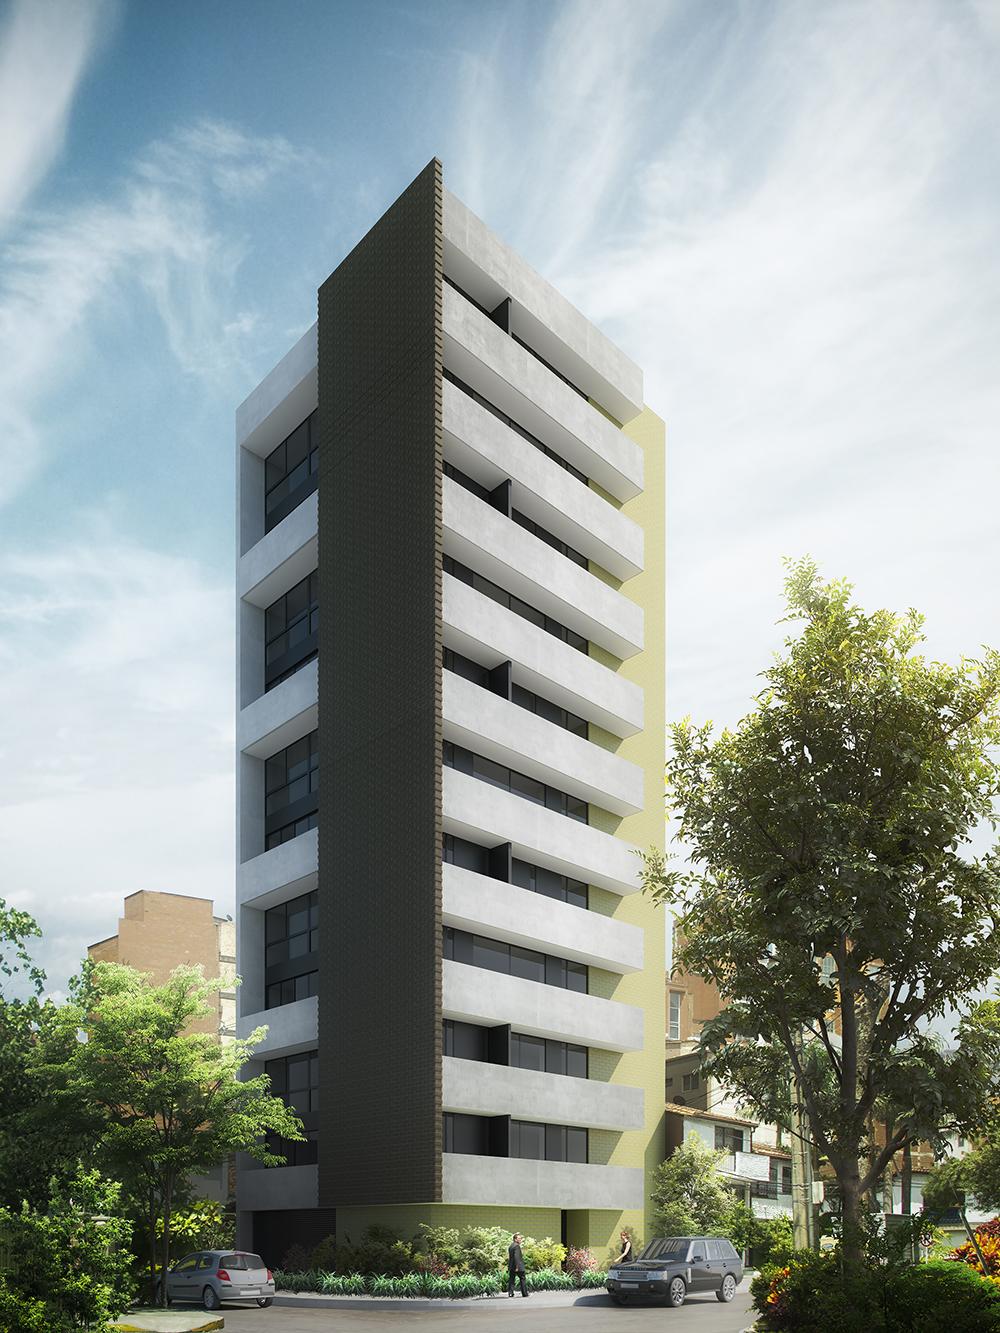 Edificio multifamiliar fachada